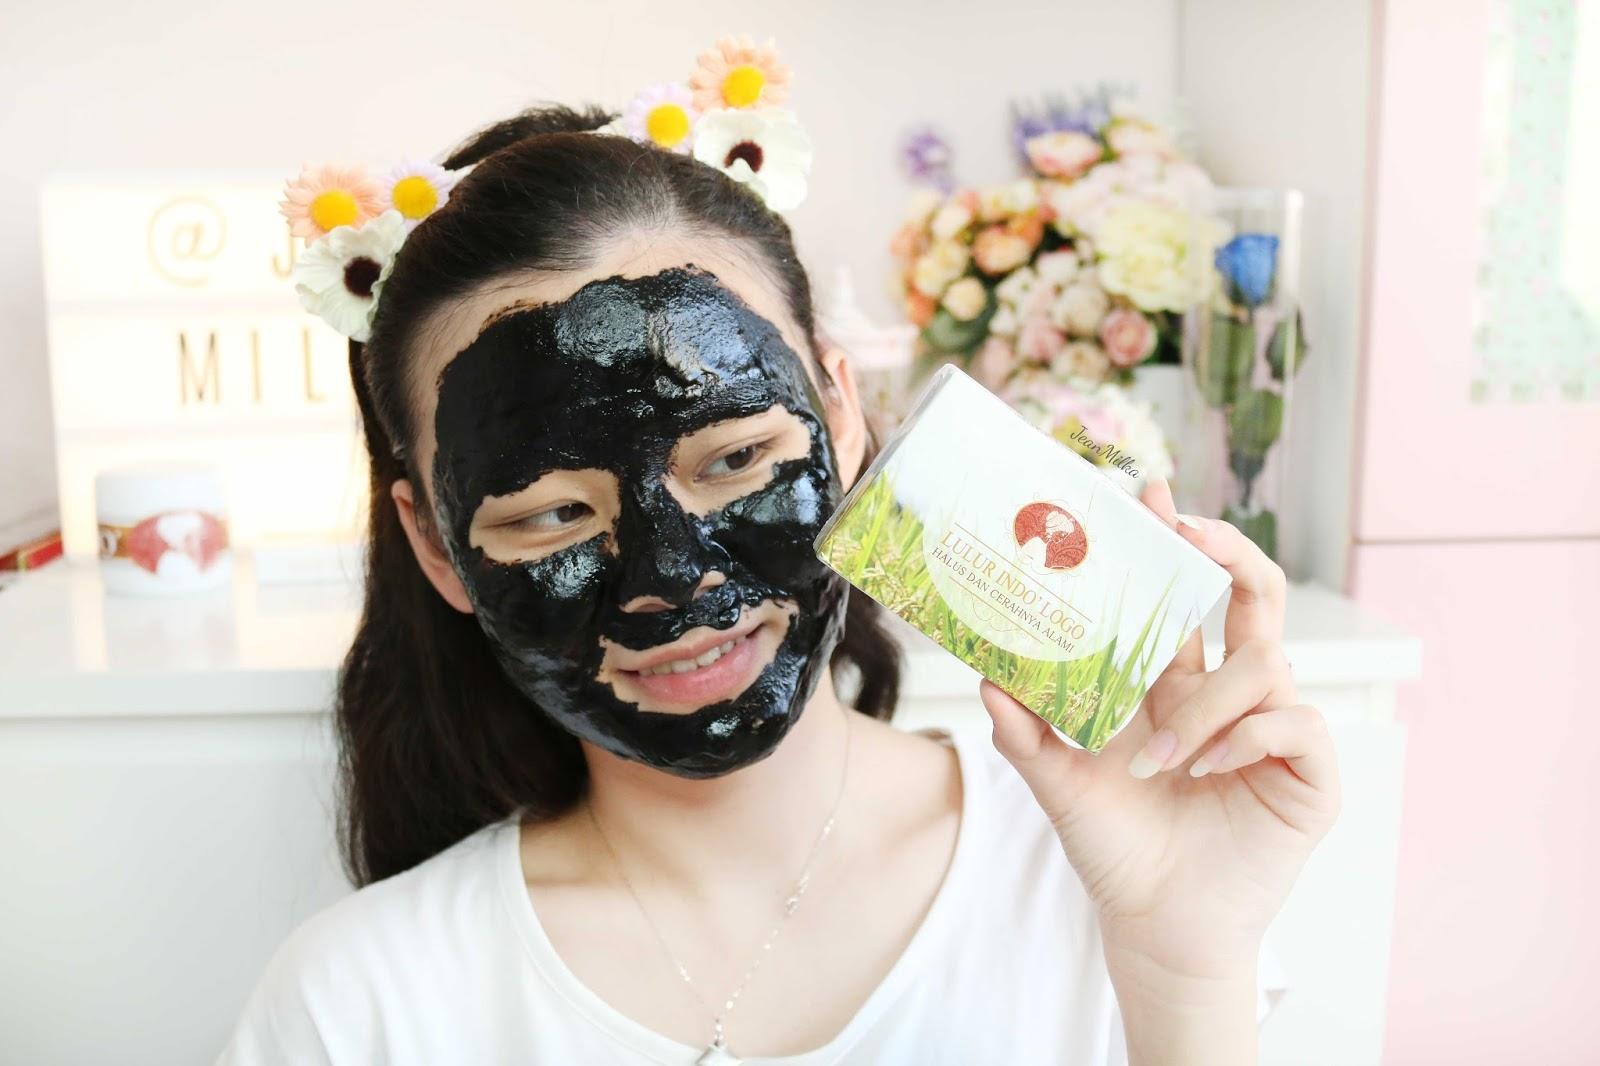 beda lontong, lulur hitam, indo logo, produk indonesia, lulur tradisonal, masker tradisional, lulur indo logo, beda lontong,